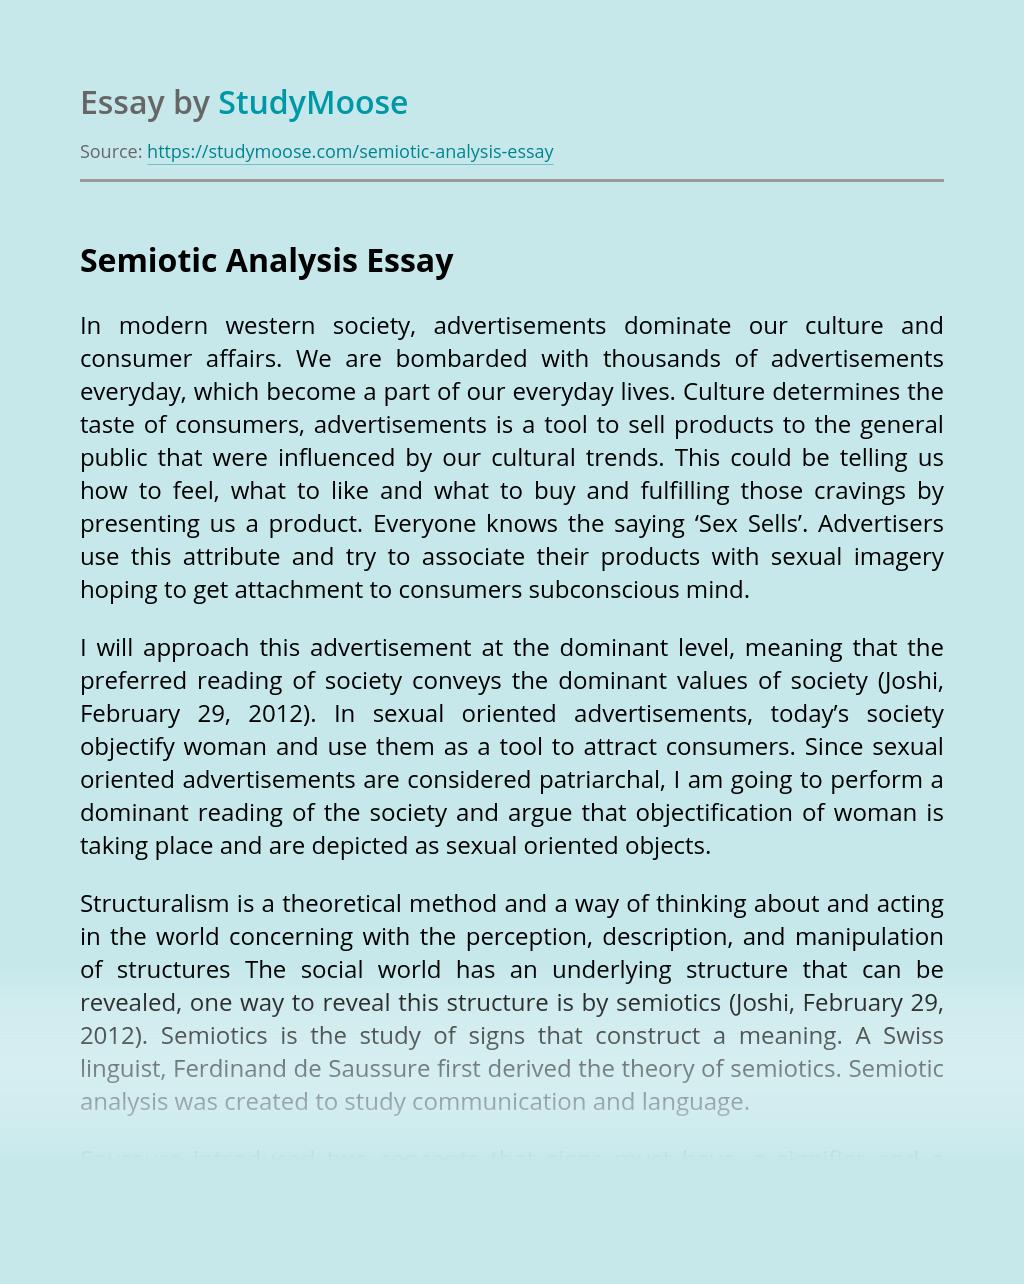 Semiotic Analysis